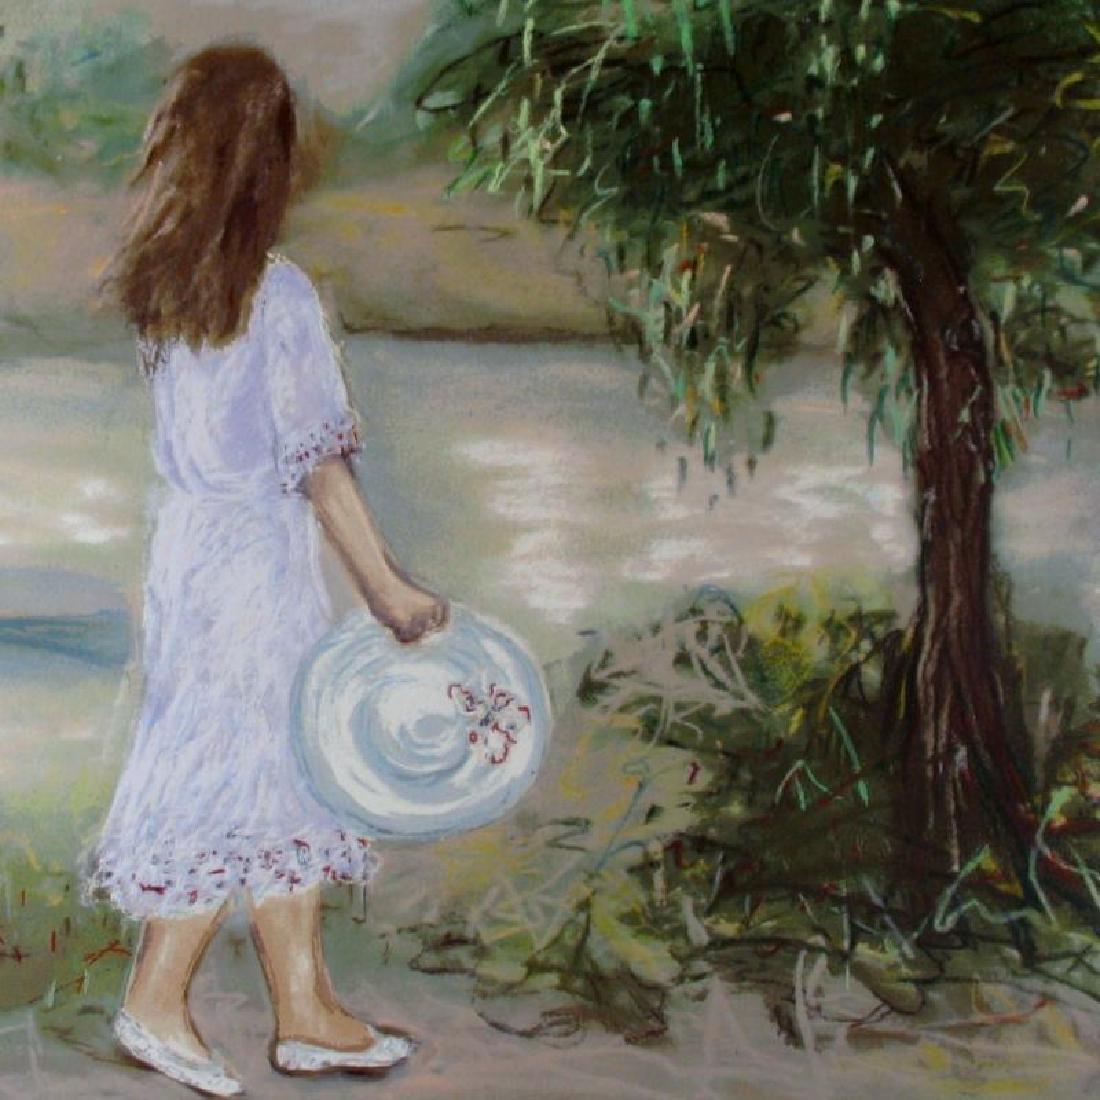 Landscape Impressionism Girl With Hat Dealer Liquidates - 3